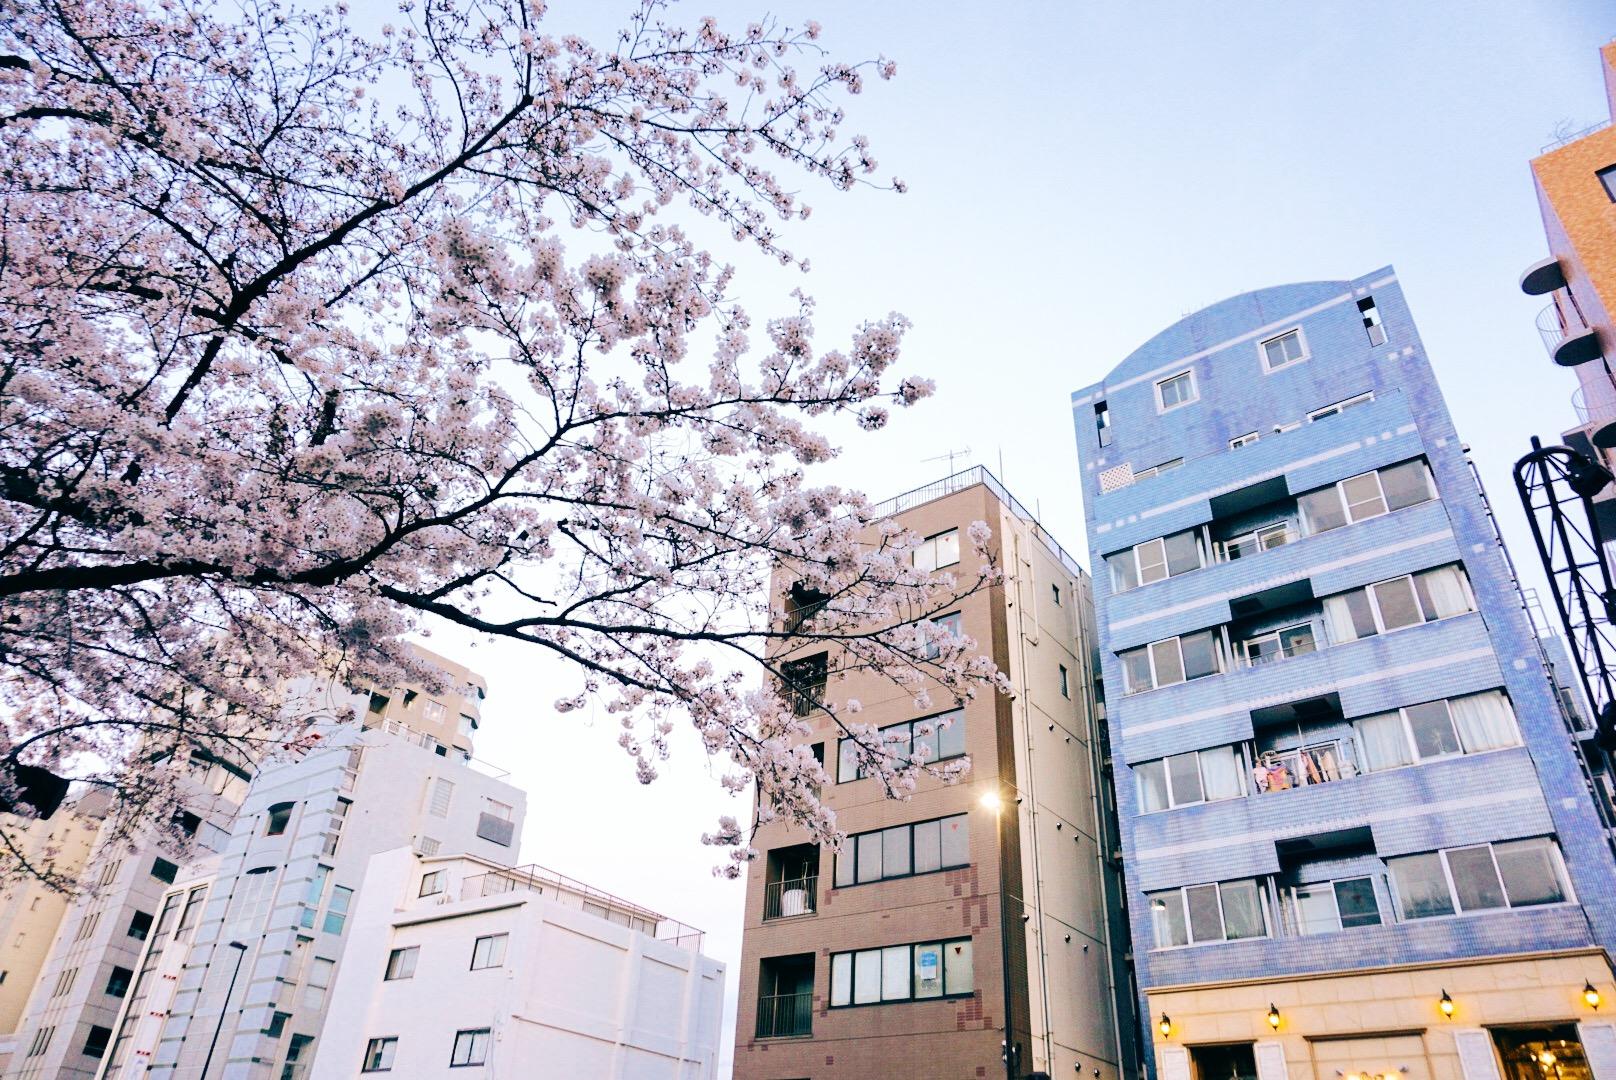 sakura-cherry-blossoms-tokyo-buildings